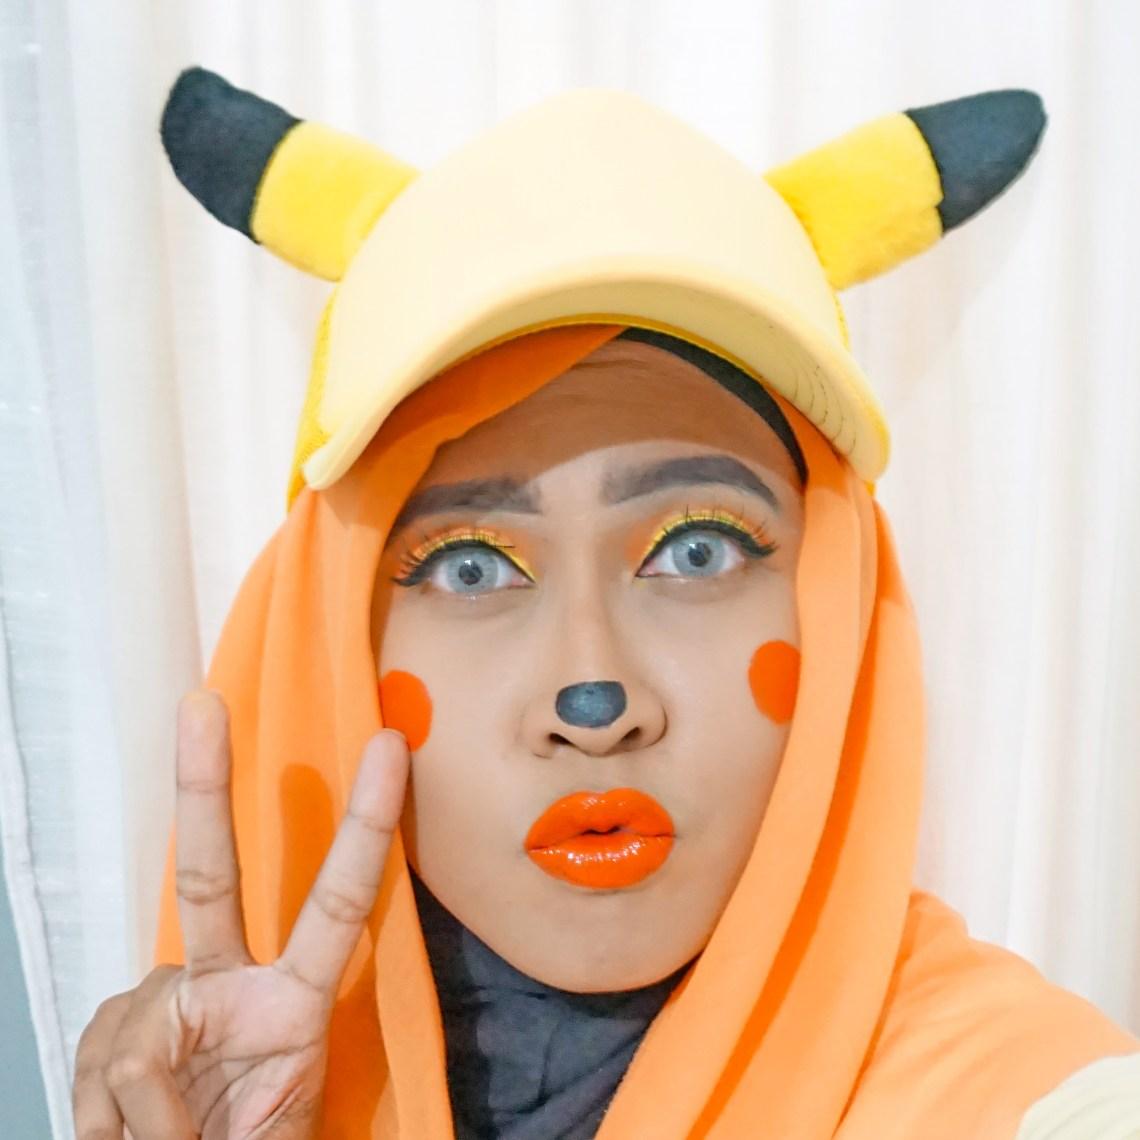 pikachu-inspired-make-up